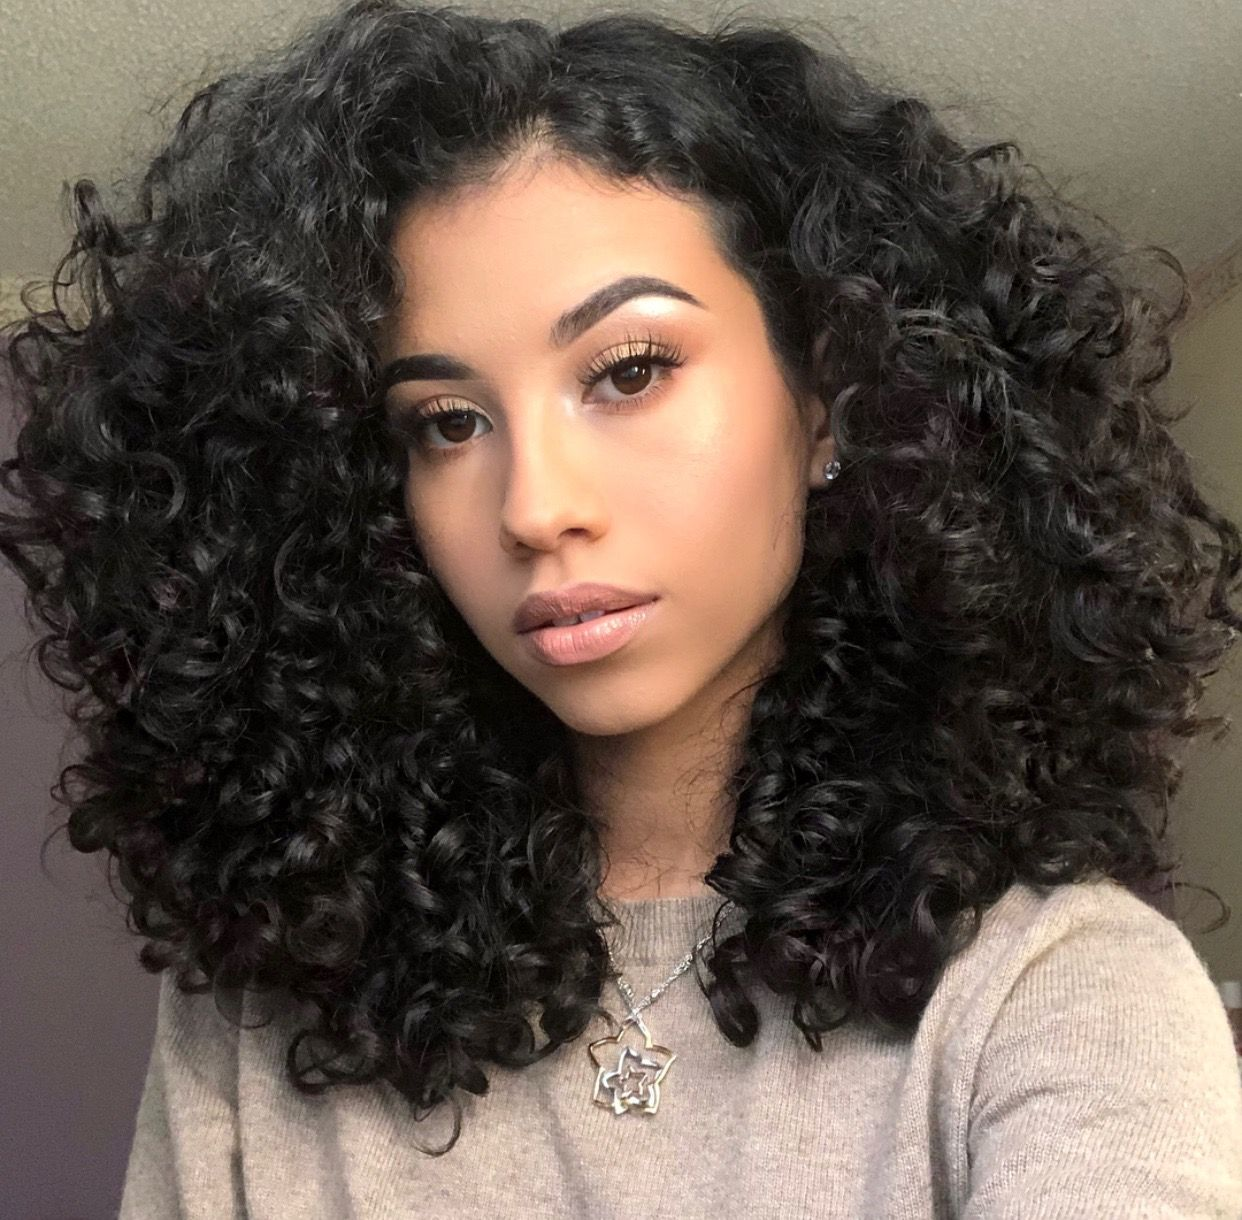 big curly hair | natural curls | 3a 3b hair type | simple